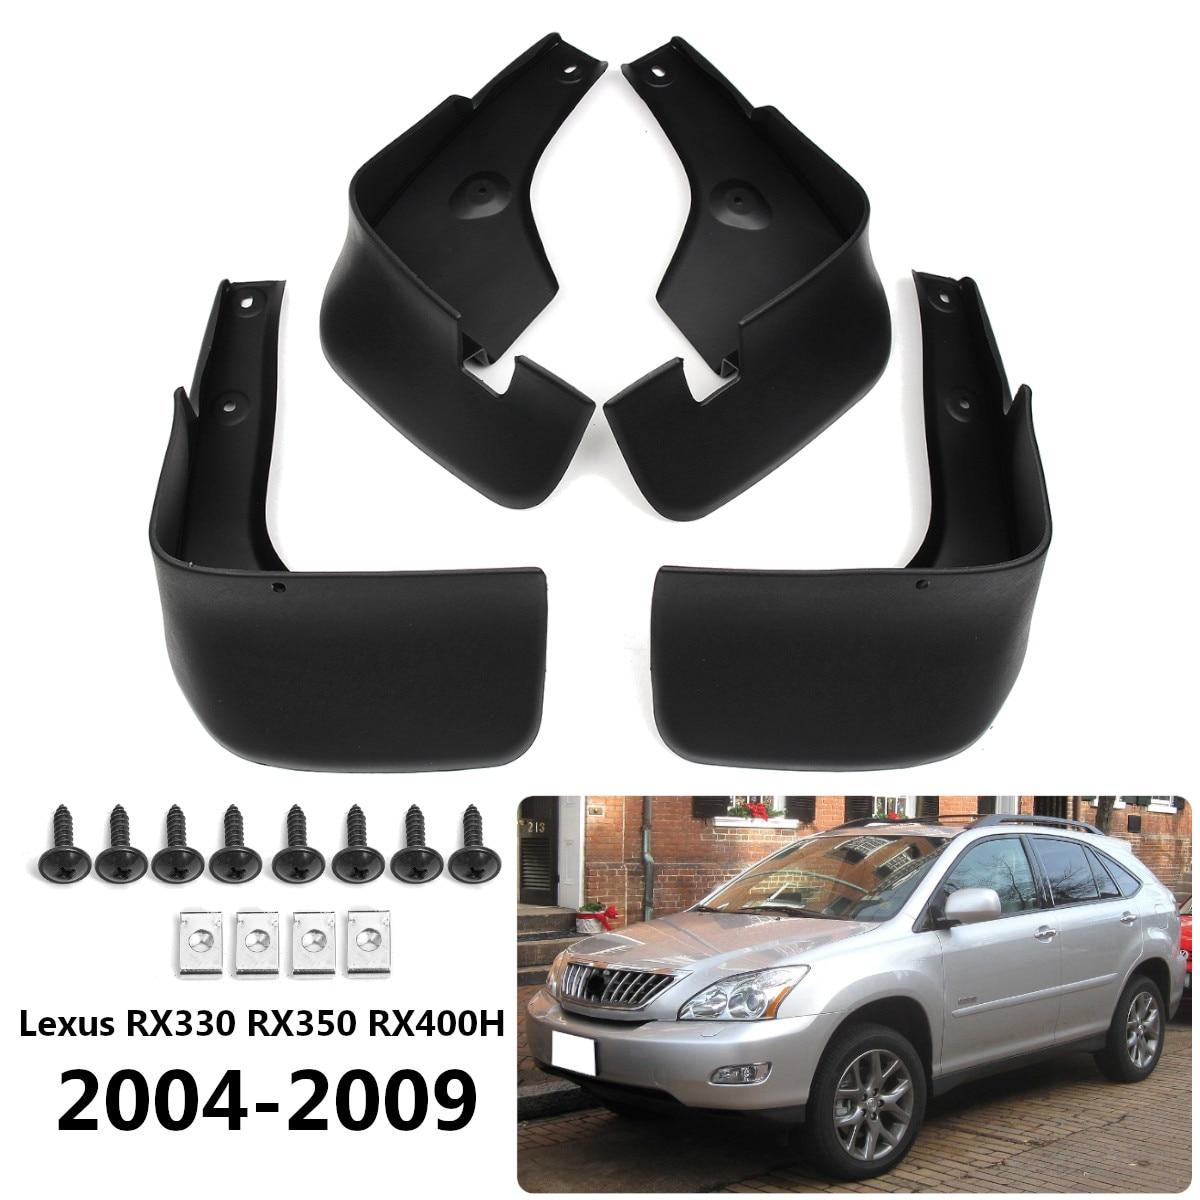 Lexus rx330 rx350 rx400h 2004-2009 mudflaps mudguards 스플래시 가드 펜더 액세서리 용 전면 리어 카 머드 플랩